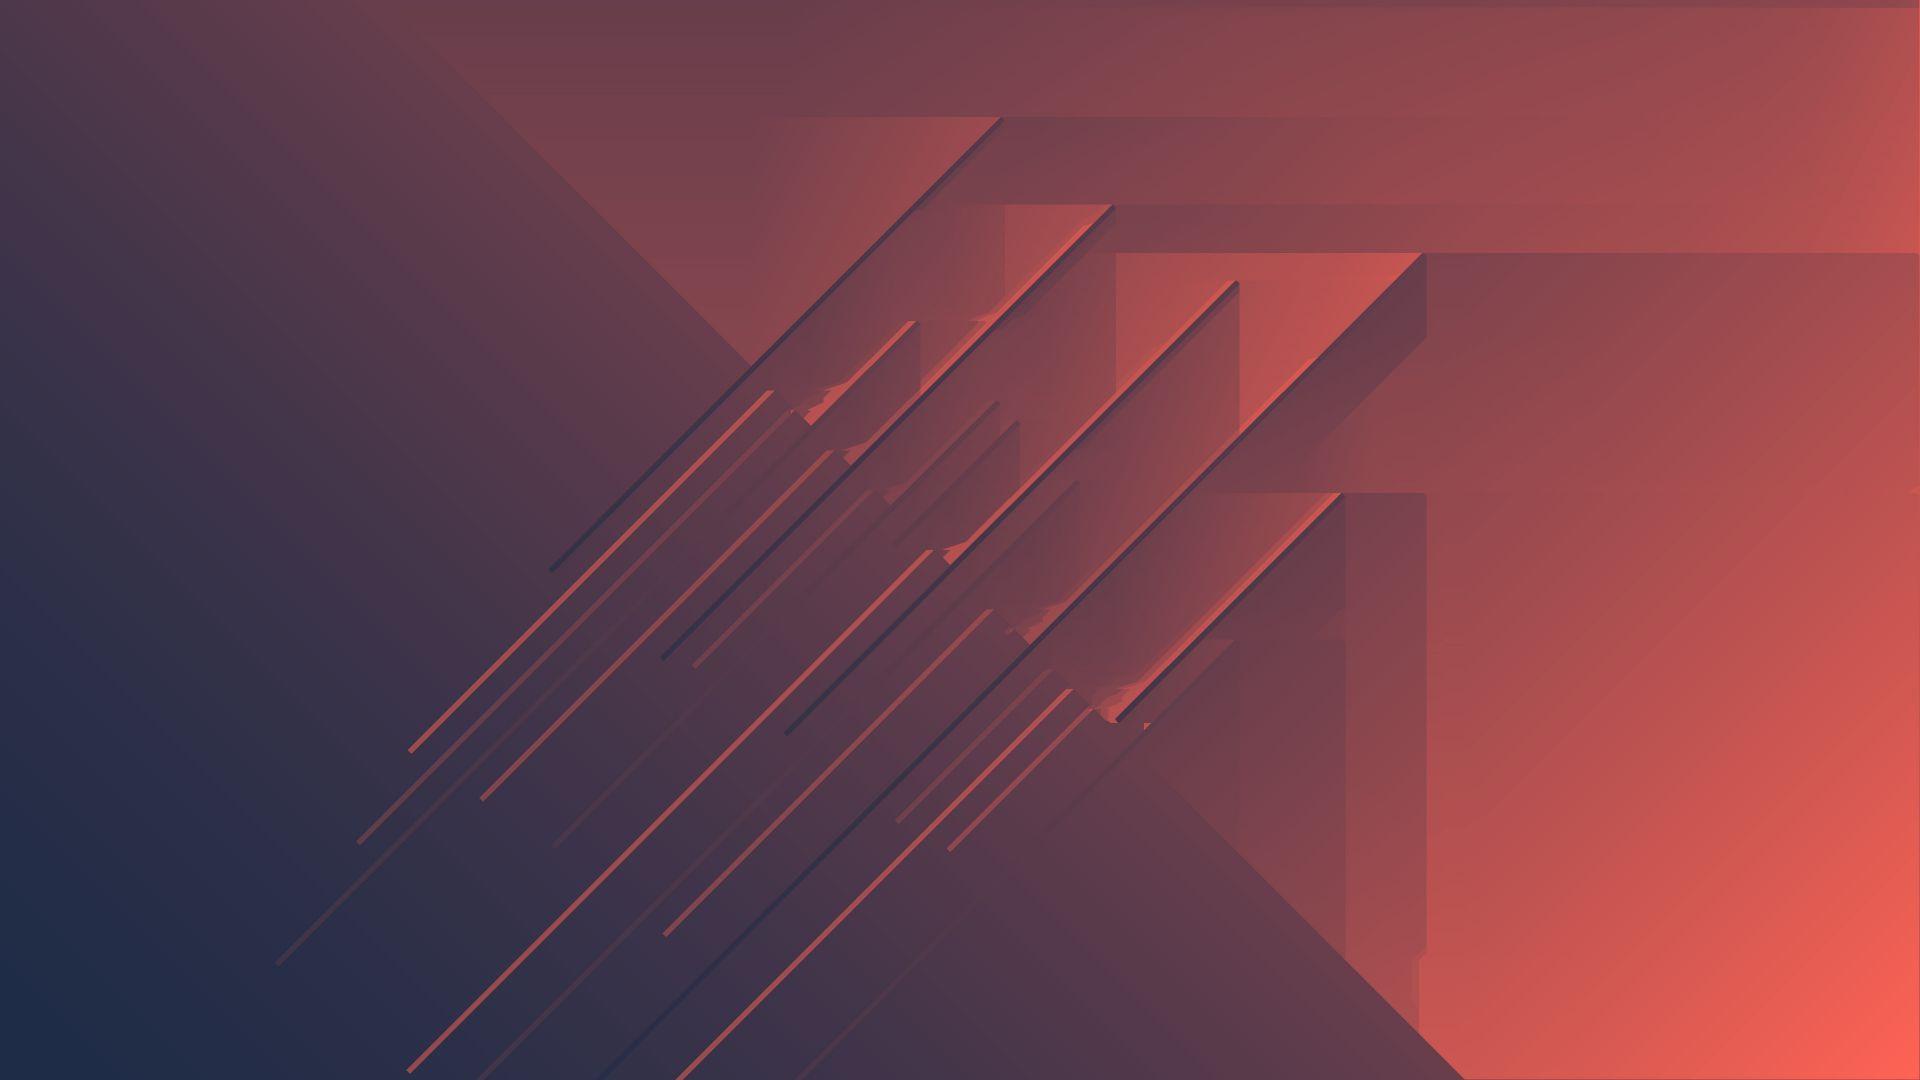 Wallpaper Abstract, minimalism, stripes, pattern, 4k